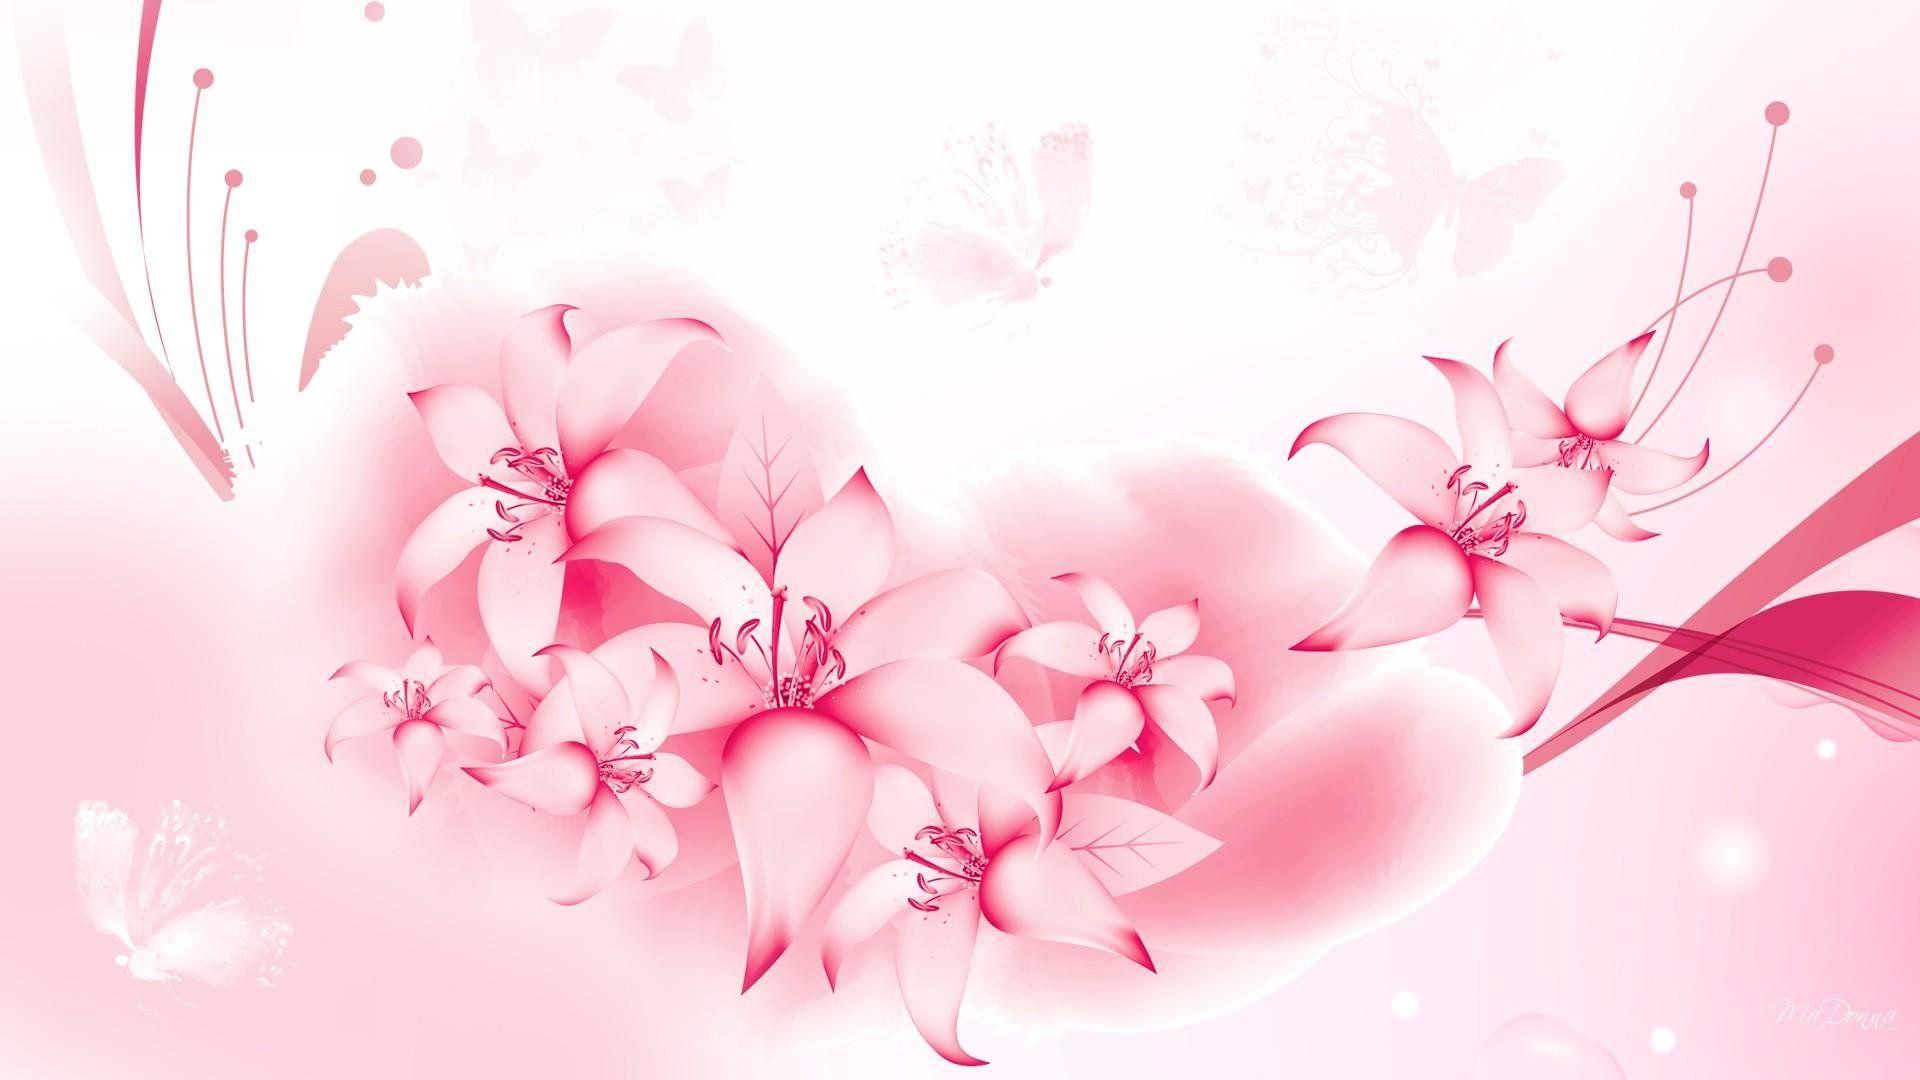 Pink Wedding Wallpaper Full Hd With Hd Desktop 1920x1080 Px 126 25 Kb Pink Wallpaper Desktop Pink Wallpaper Wedding Backgrounds